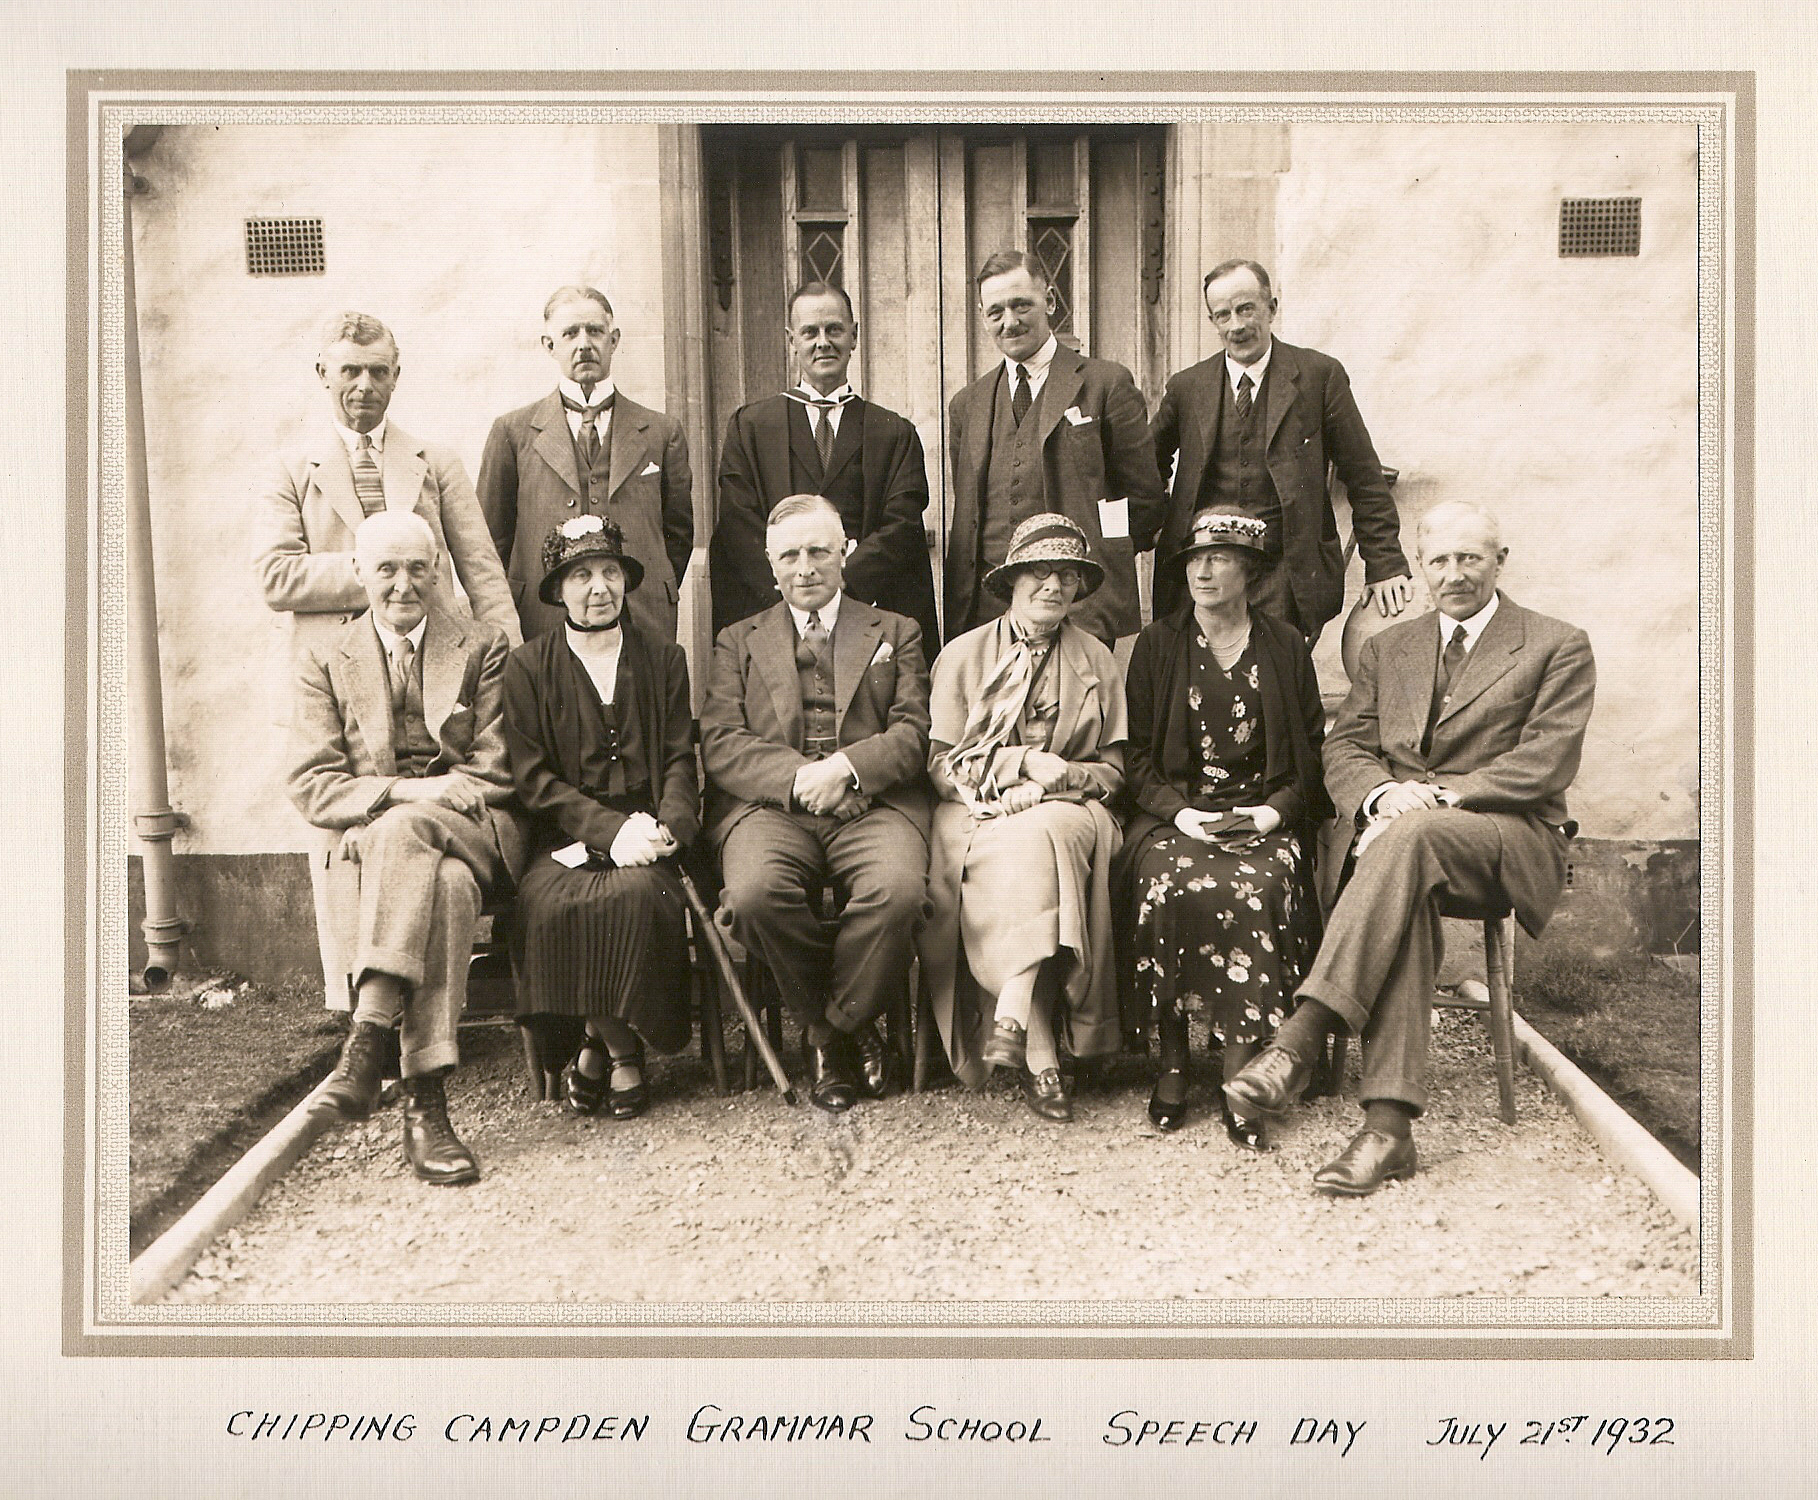 Speech Day 21st July 1932